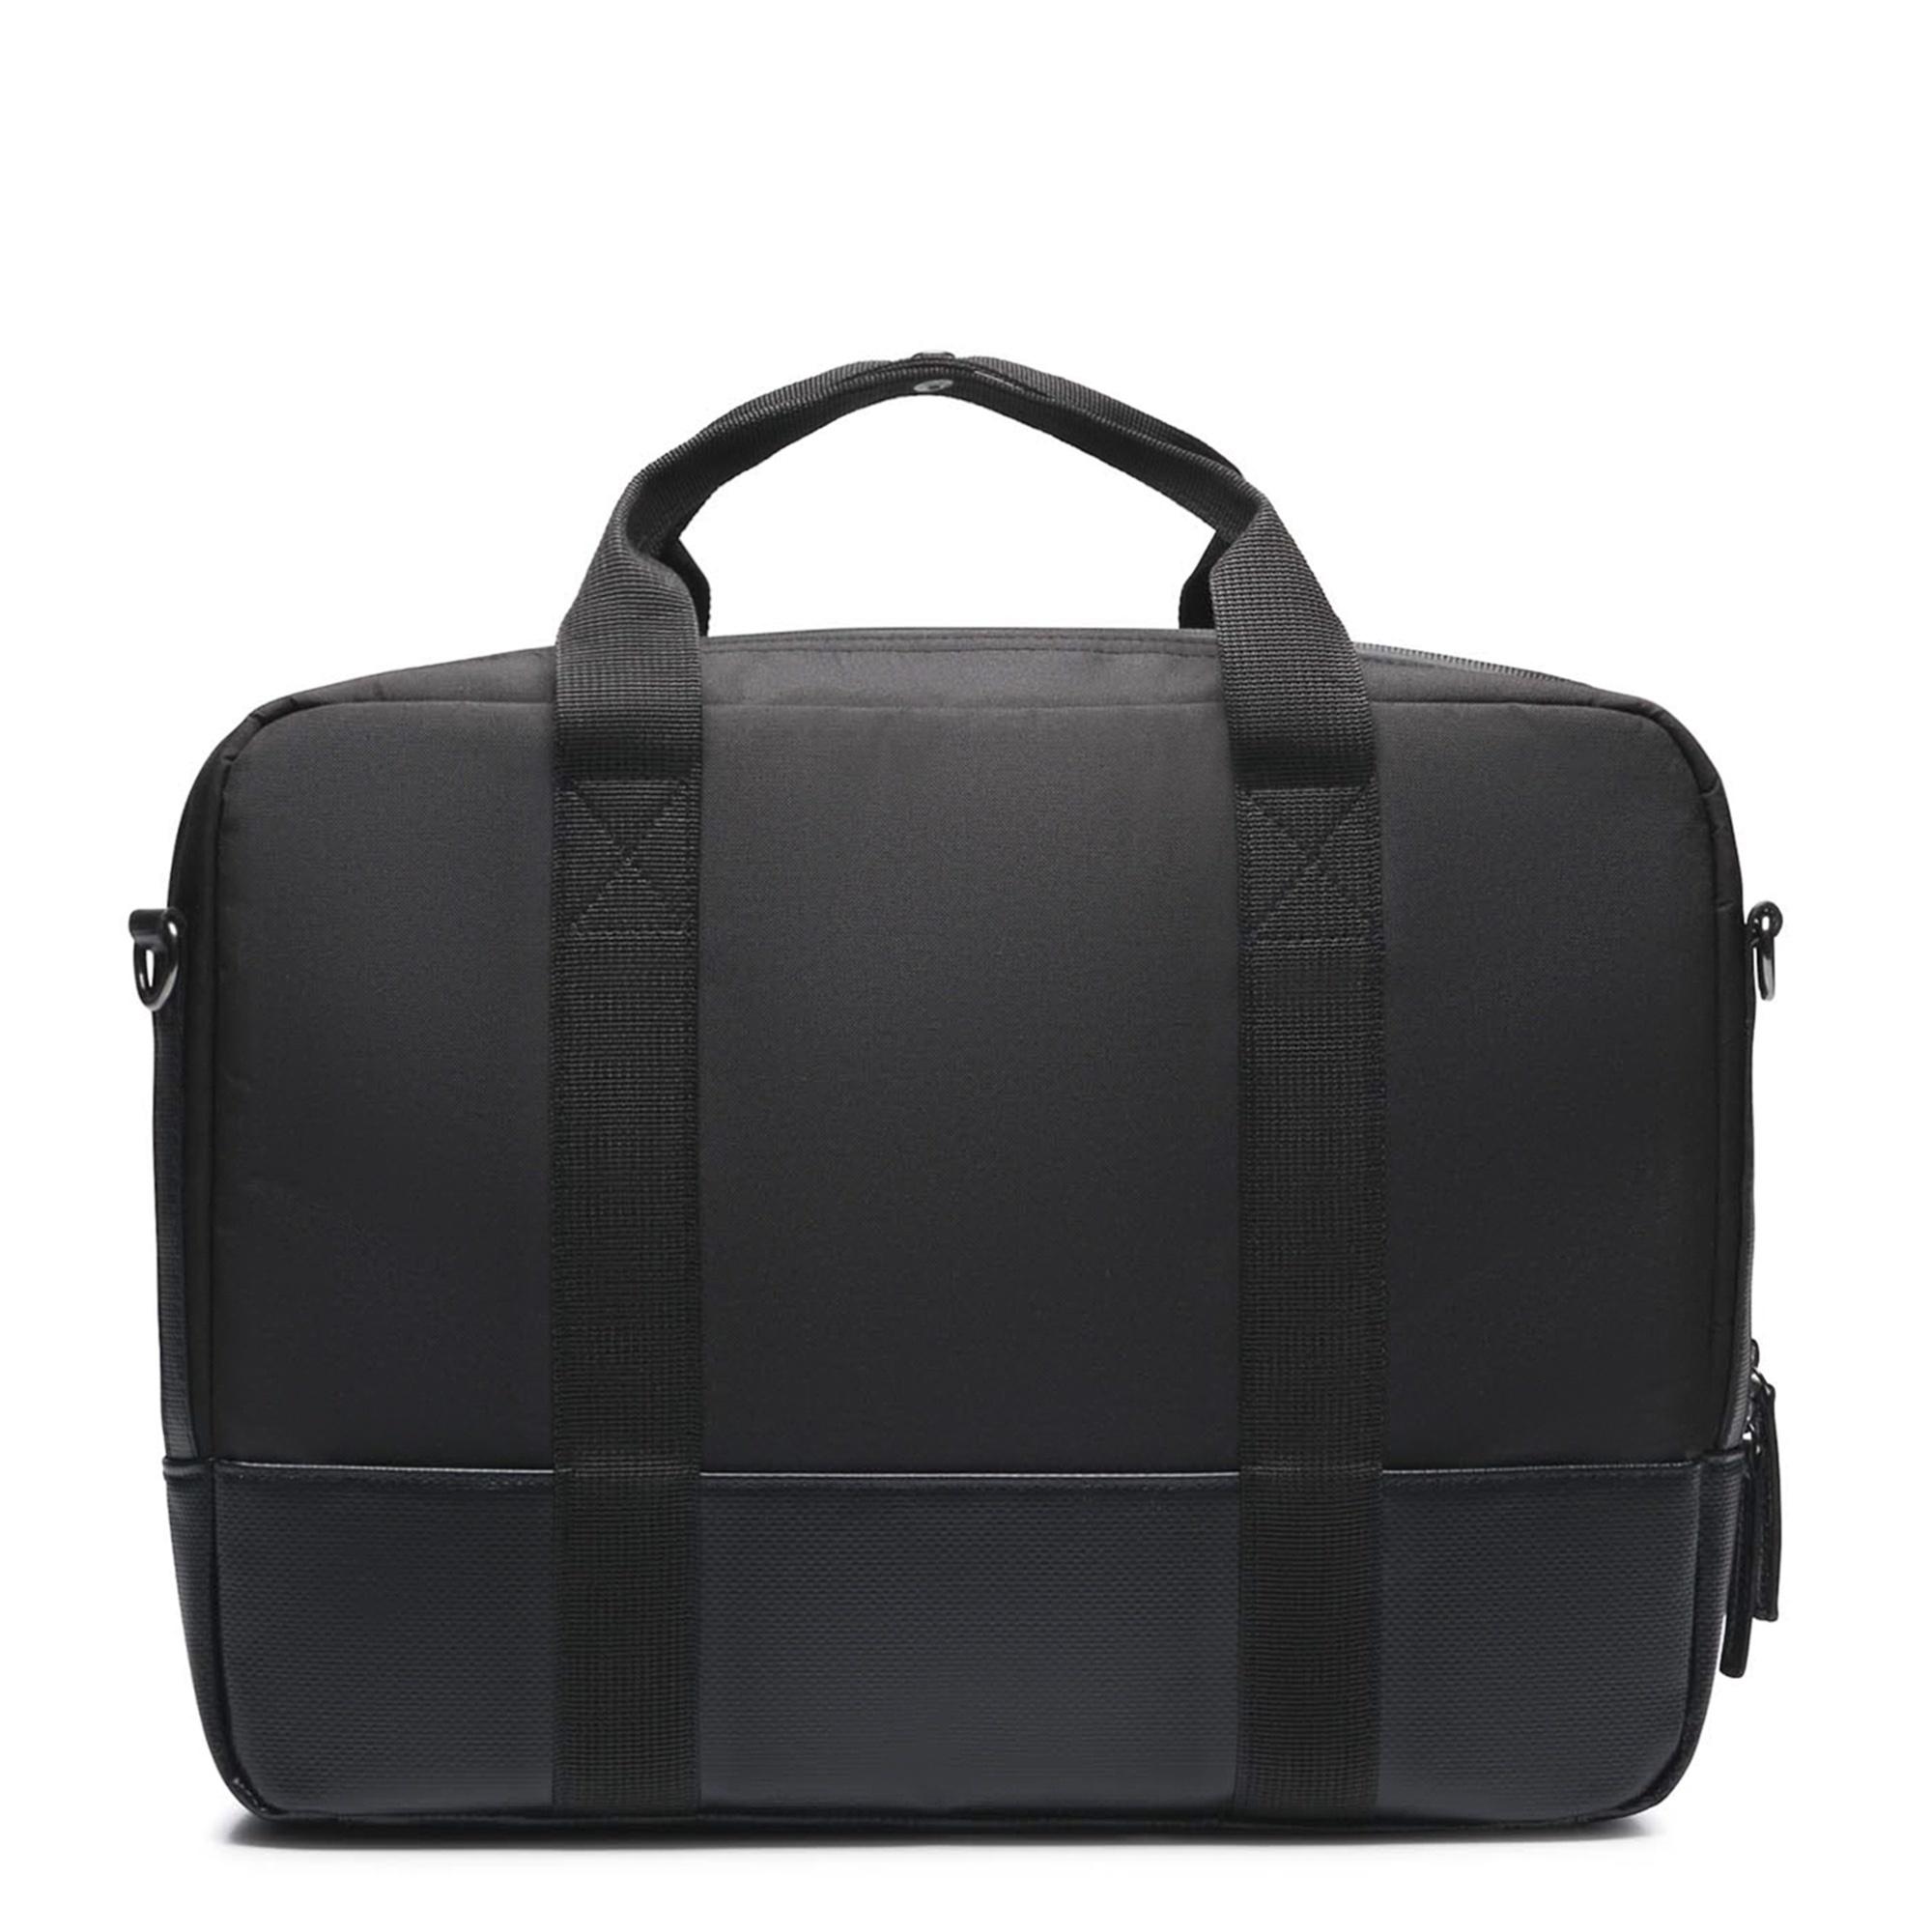 Sem Lewis Northern Hampstead borsa del portatile nero